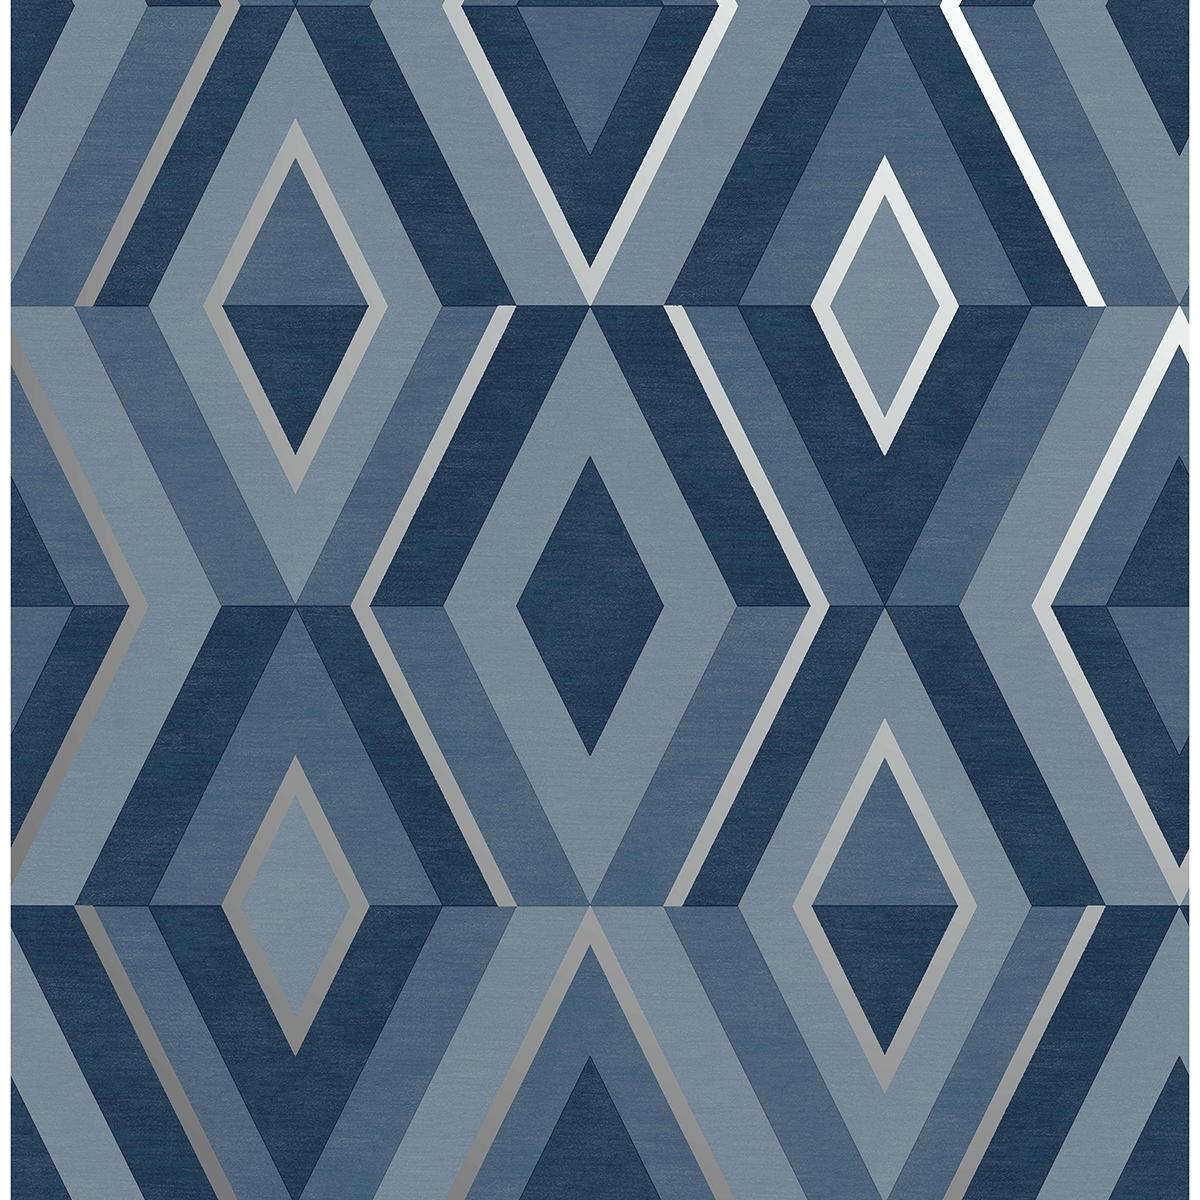 FD42608 - Shard Blue Geometric Wallpaper - by Fine Decor